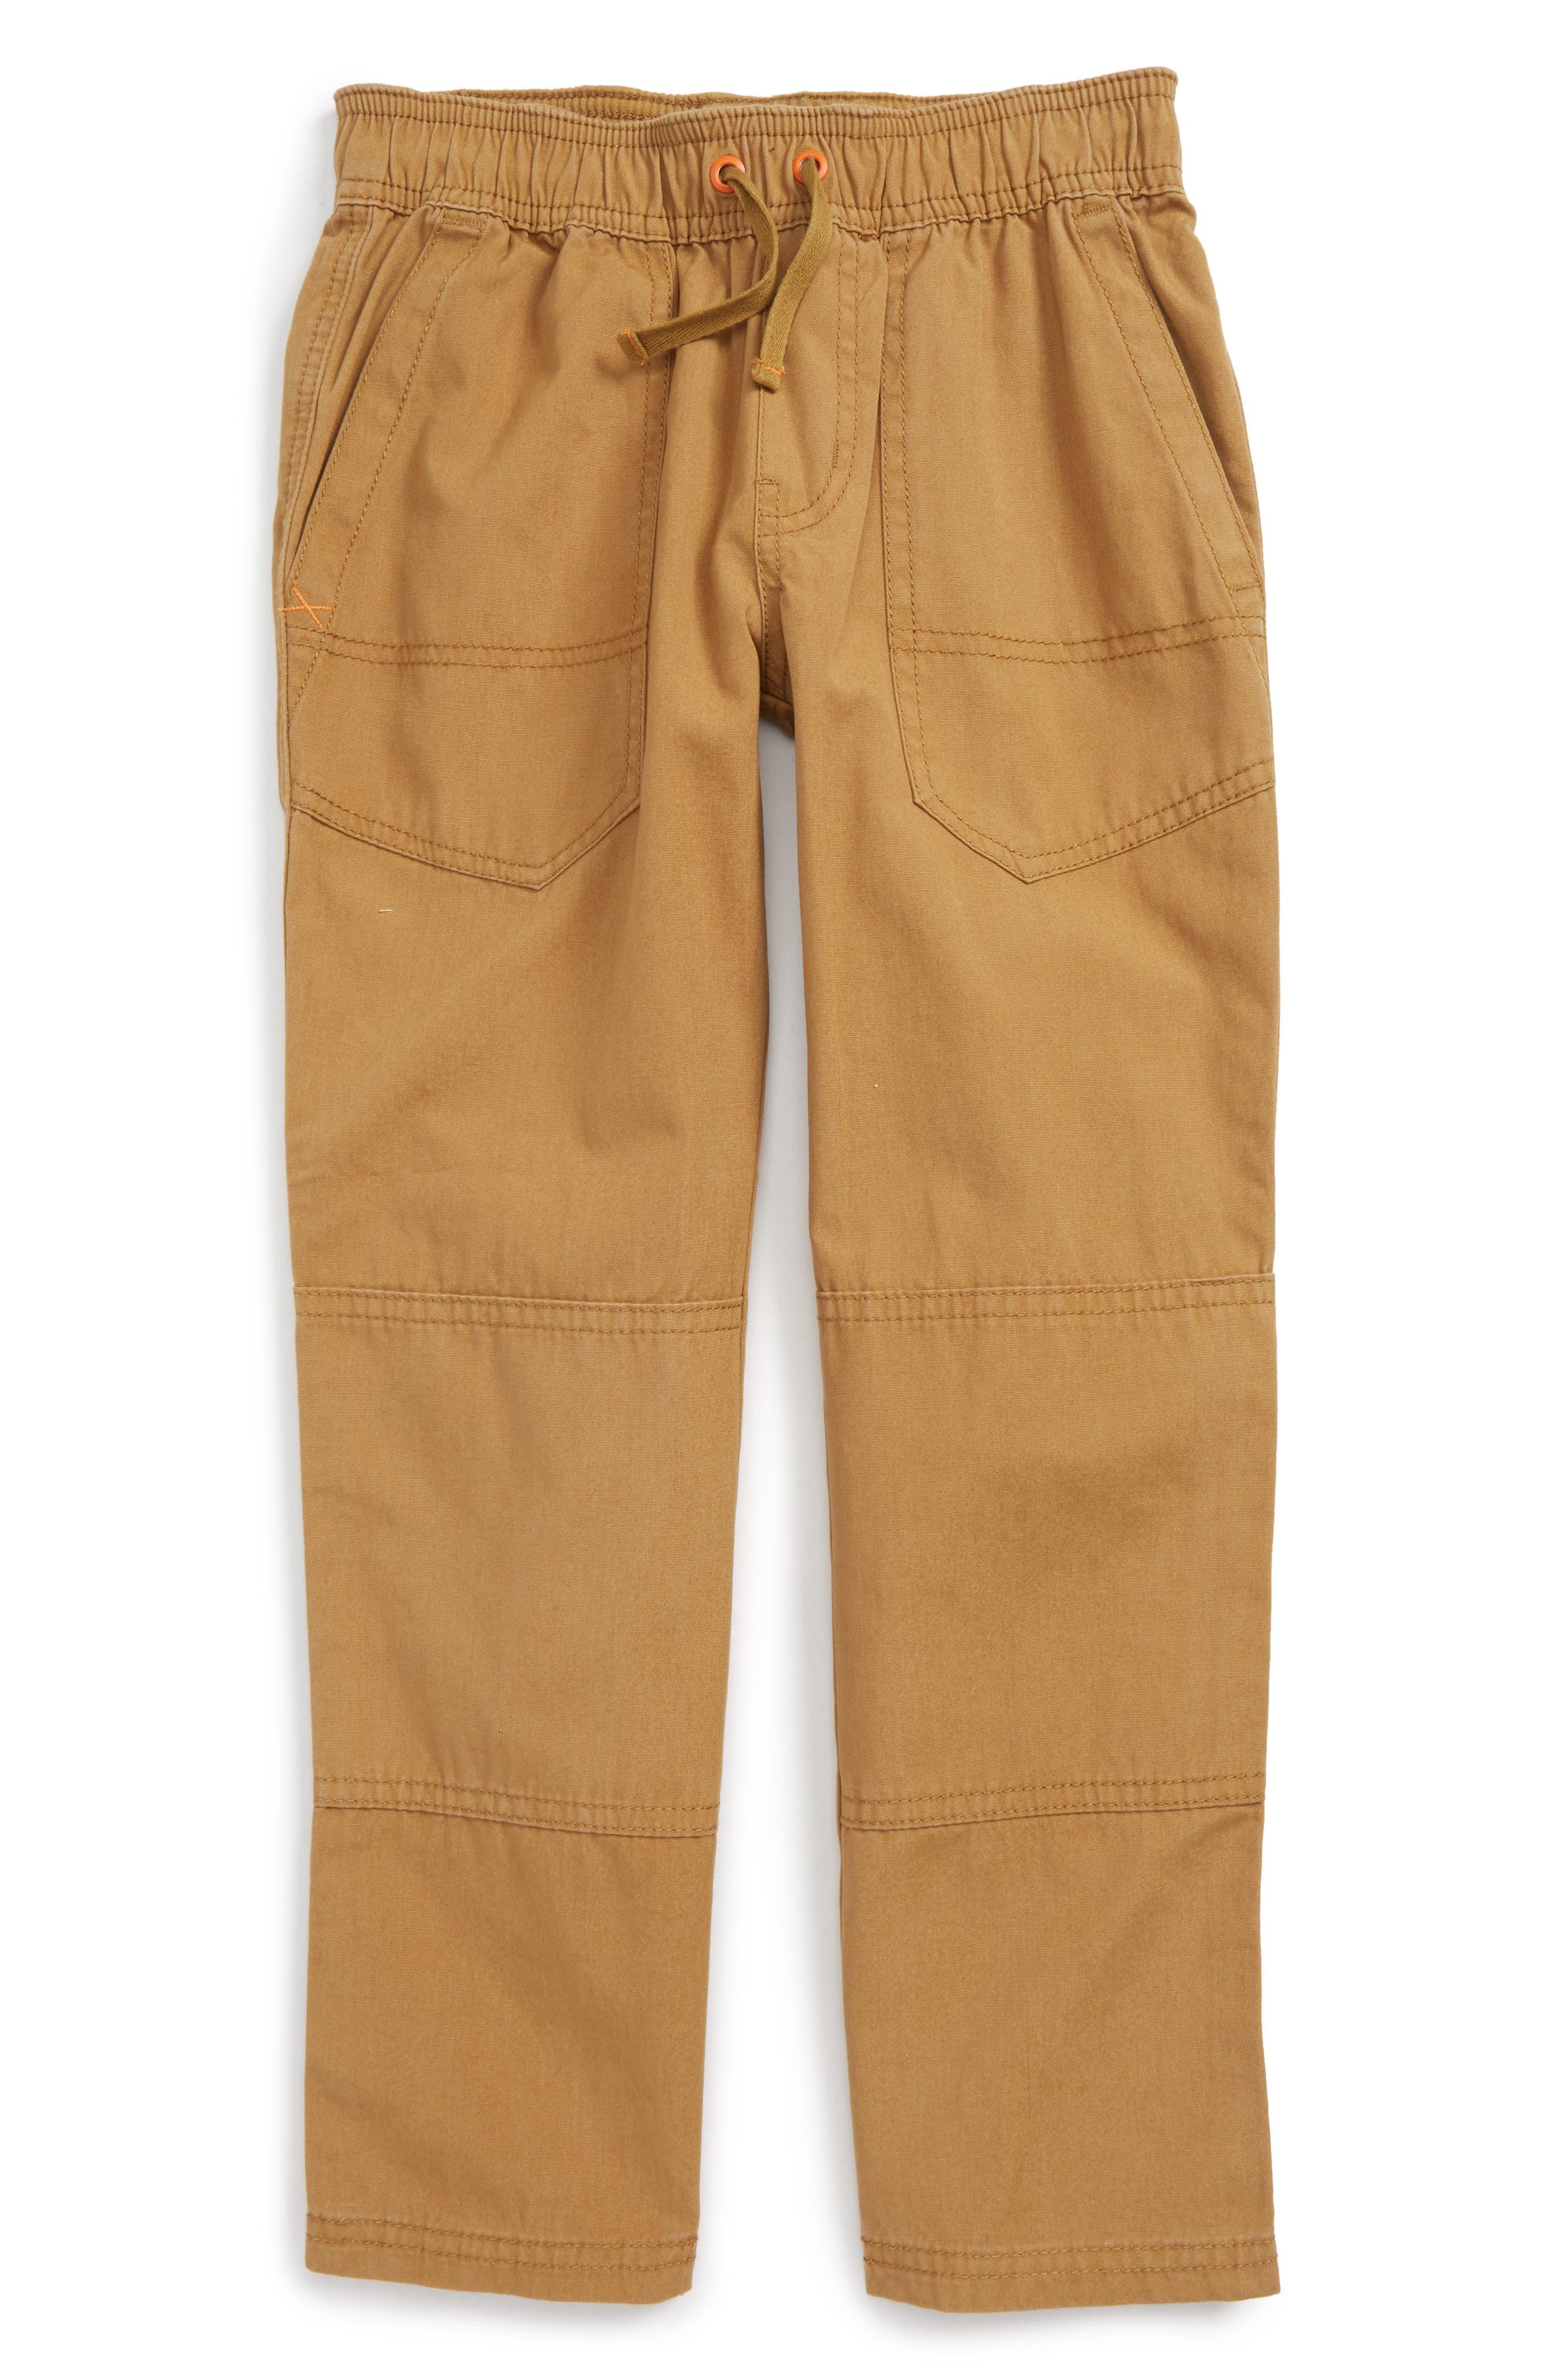 Tea Collection Canvas Explorer Pants (Toddler Boys & Little Boys)